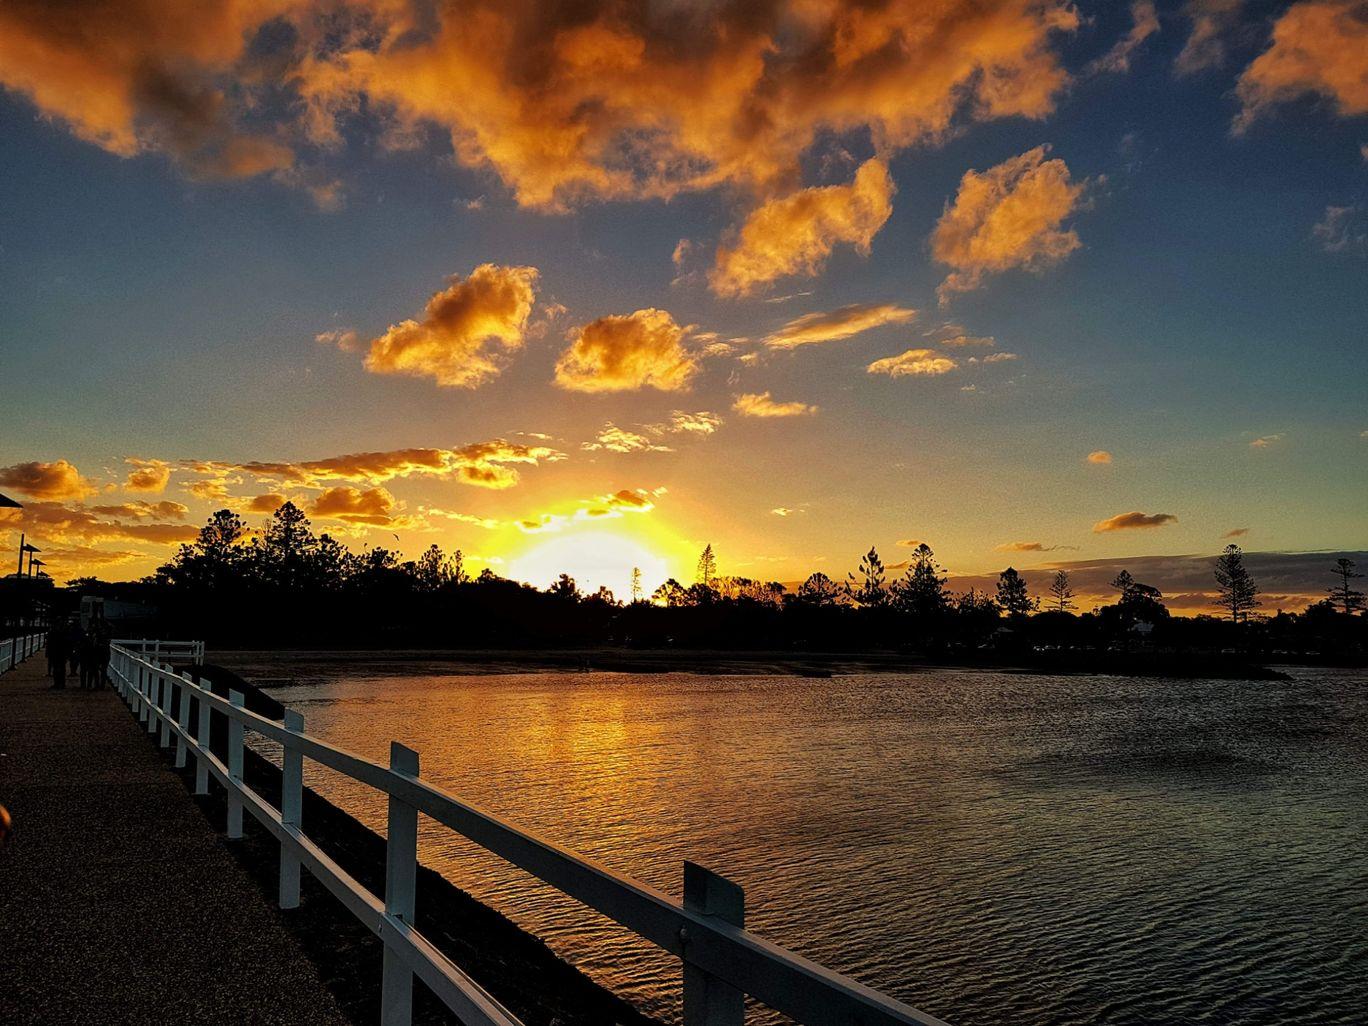 Photo of Australia By Digvirsinh Rathod